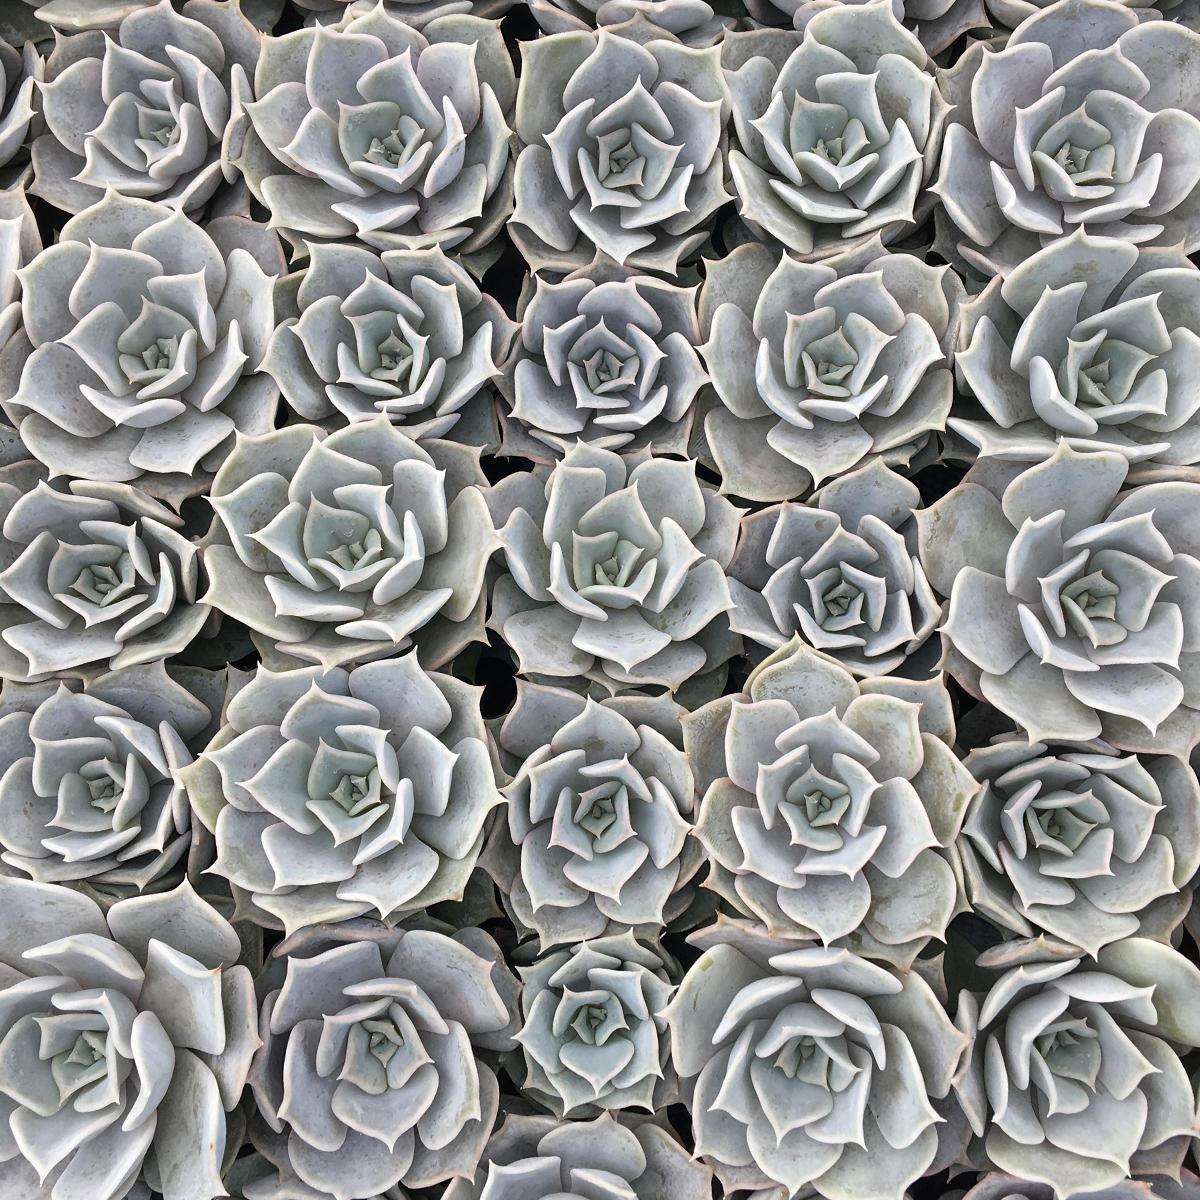 Echeveria Lilacina image